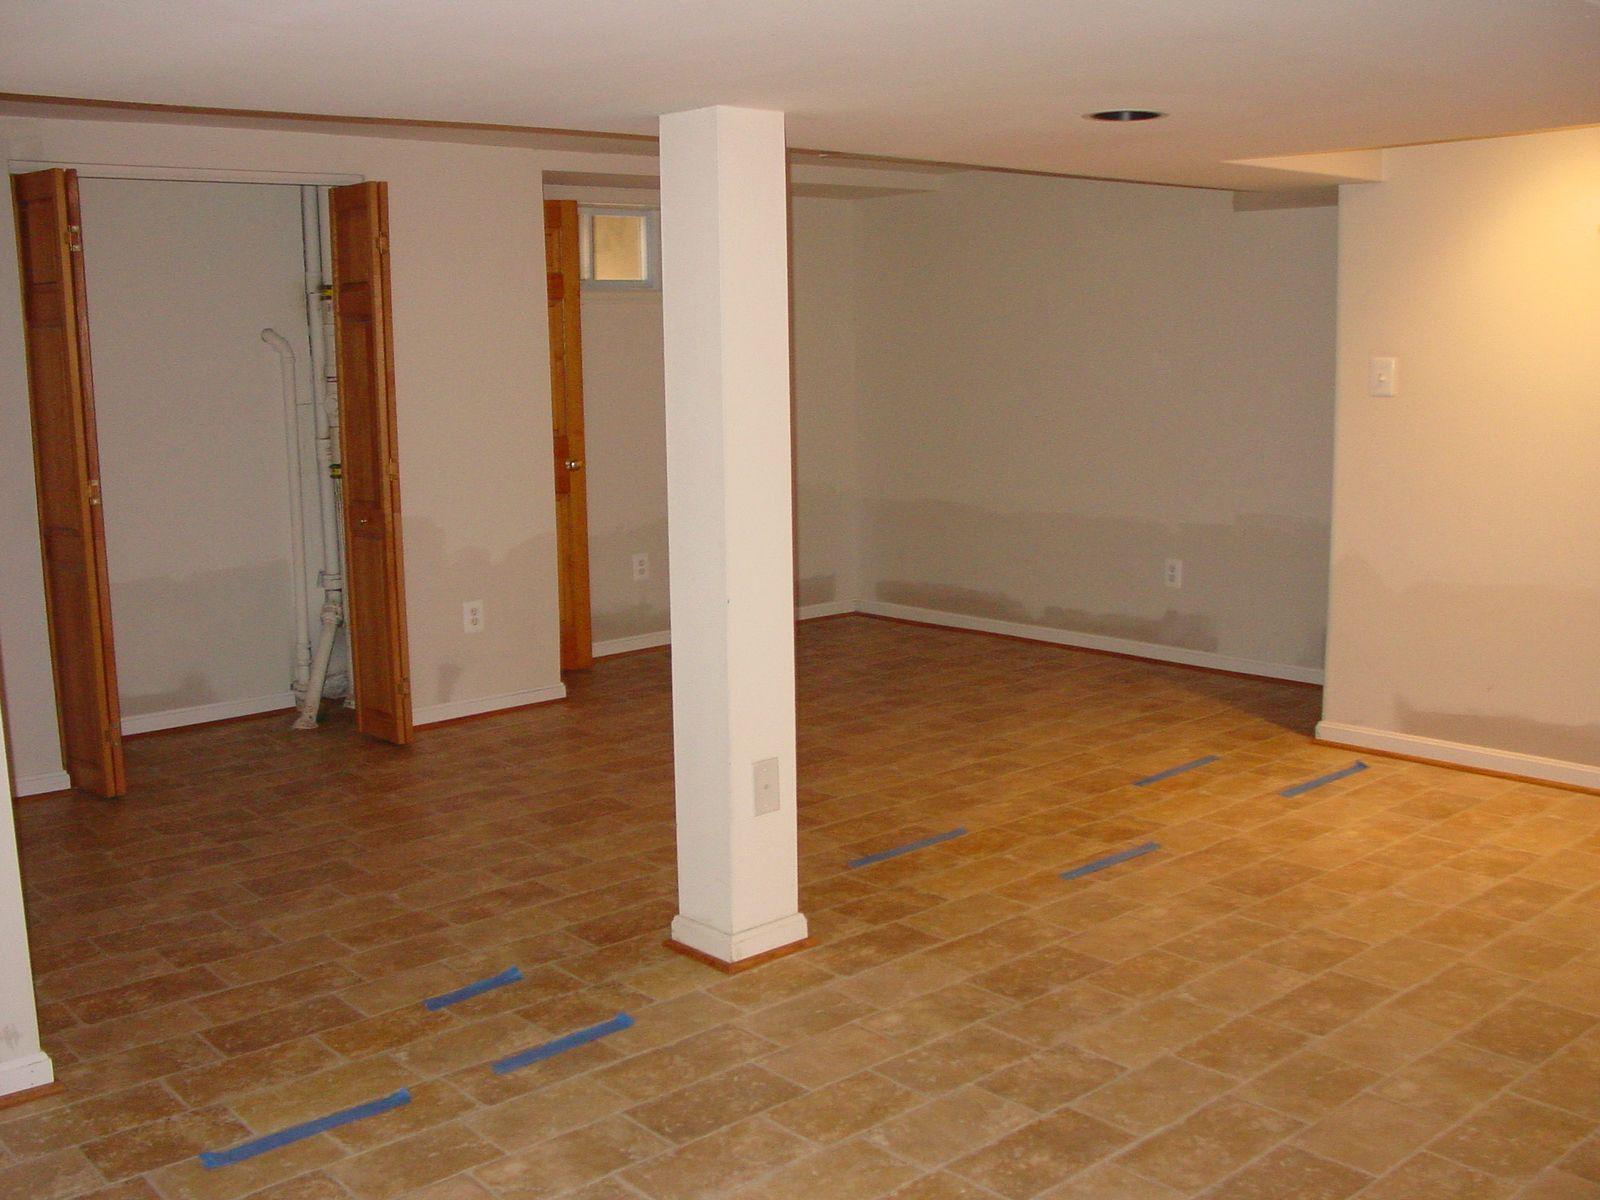 Basement Remodel Contractors small basement remodeling ideas | cook bros. #1 design build